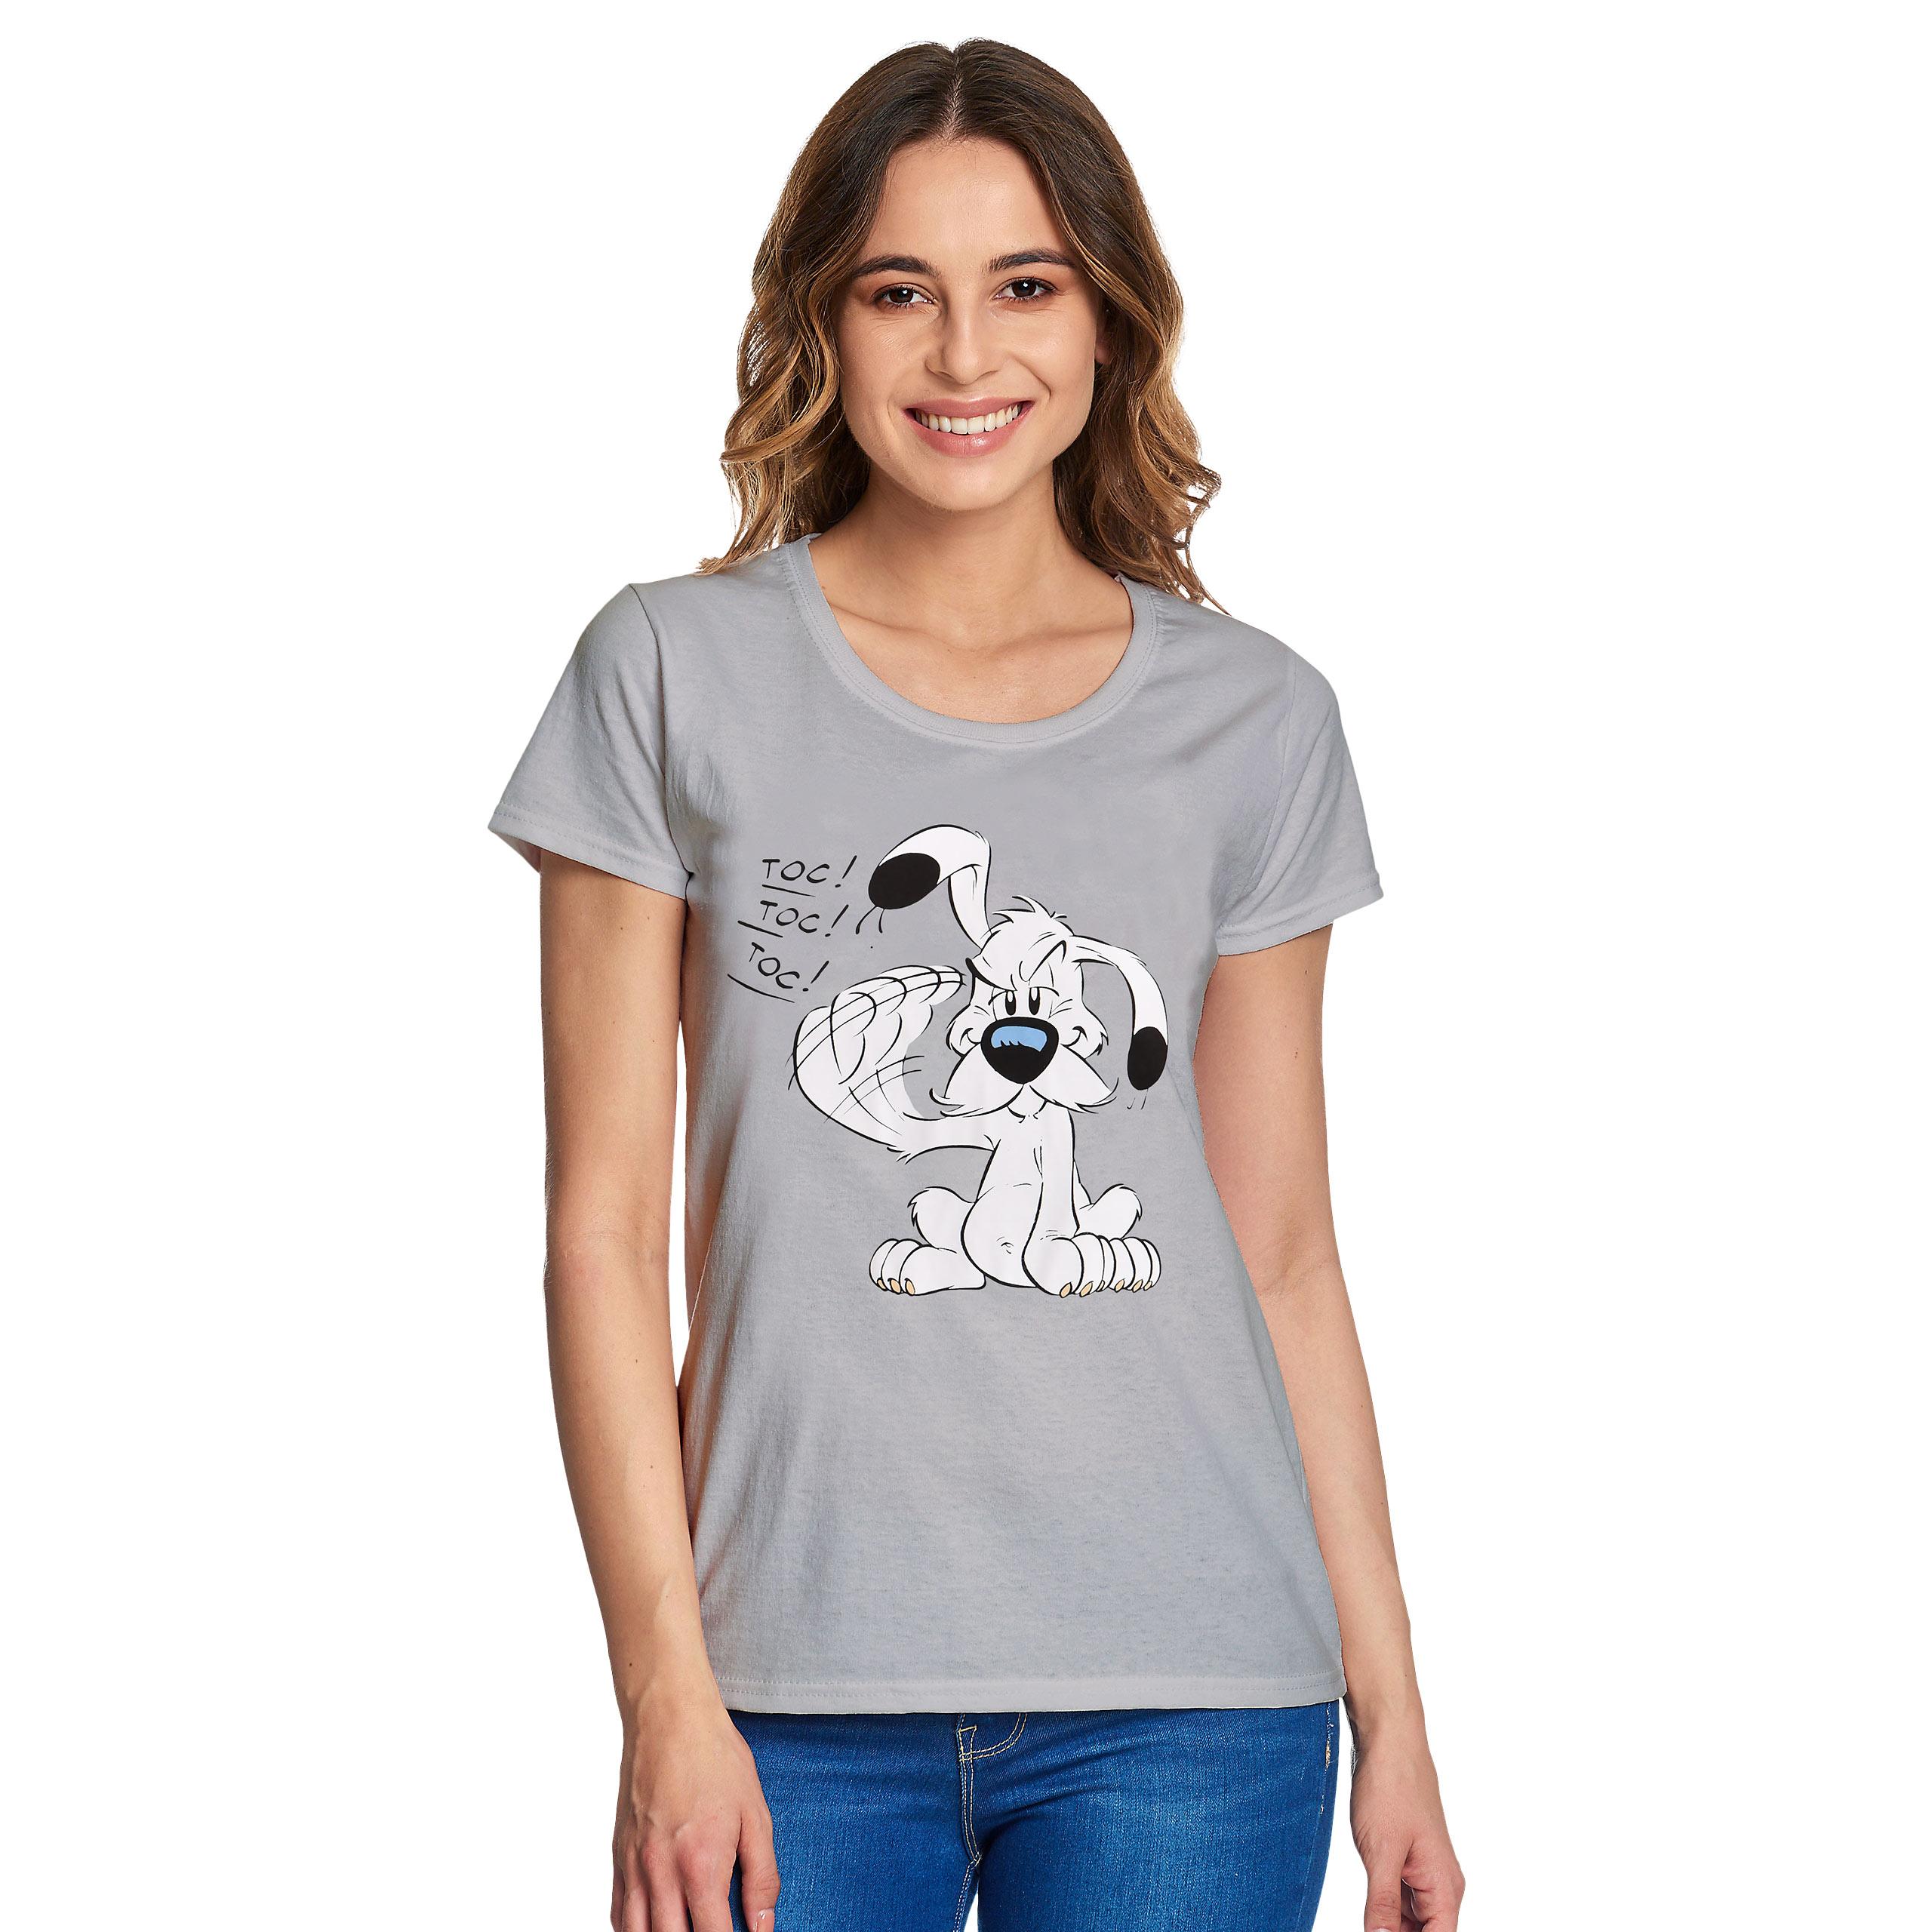 Asterix - Idefix T-Shirt Damen grau